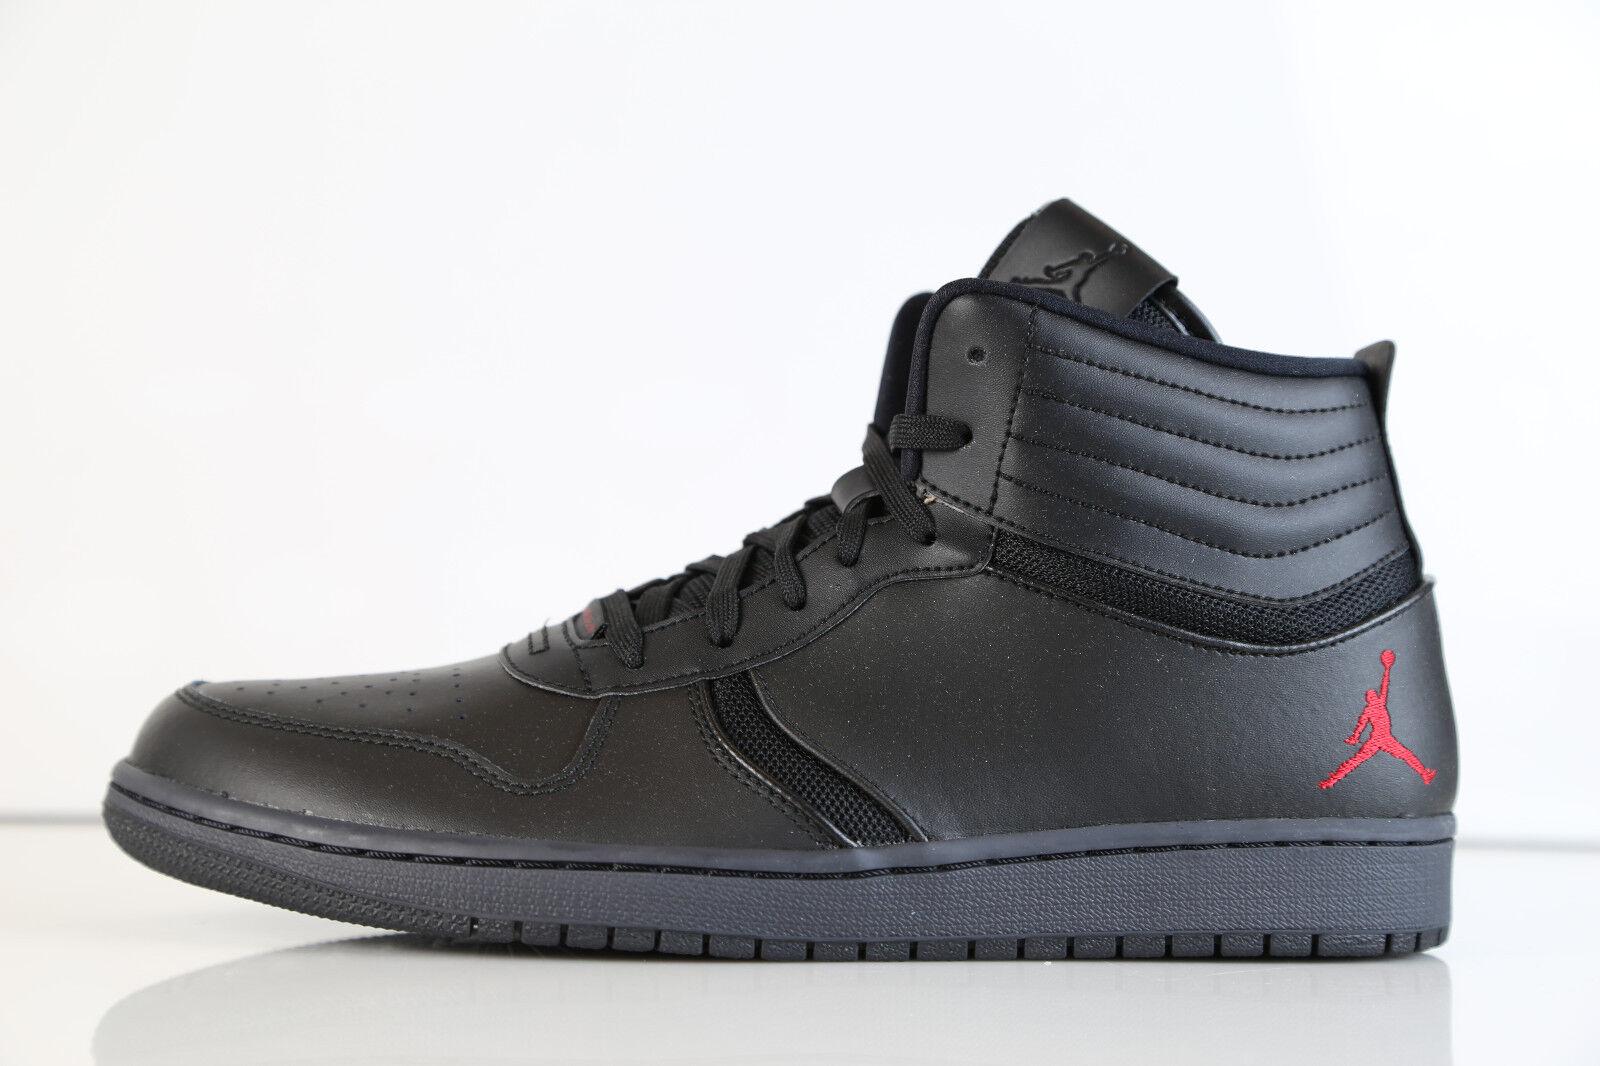 Nike Air Jordan Patrimonio Negro Gimnasio Rojo Blazer 88632018 814 1 11 Blazer Rojo PRM ece989